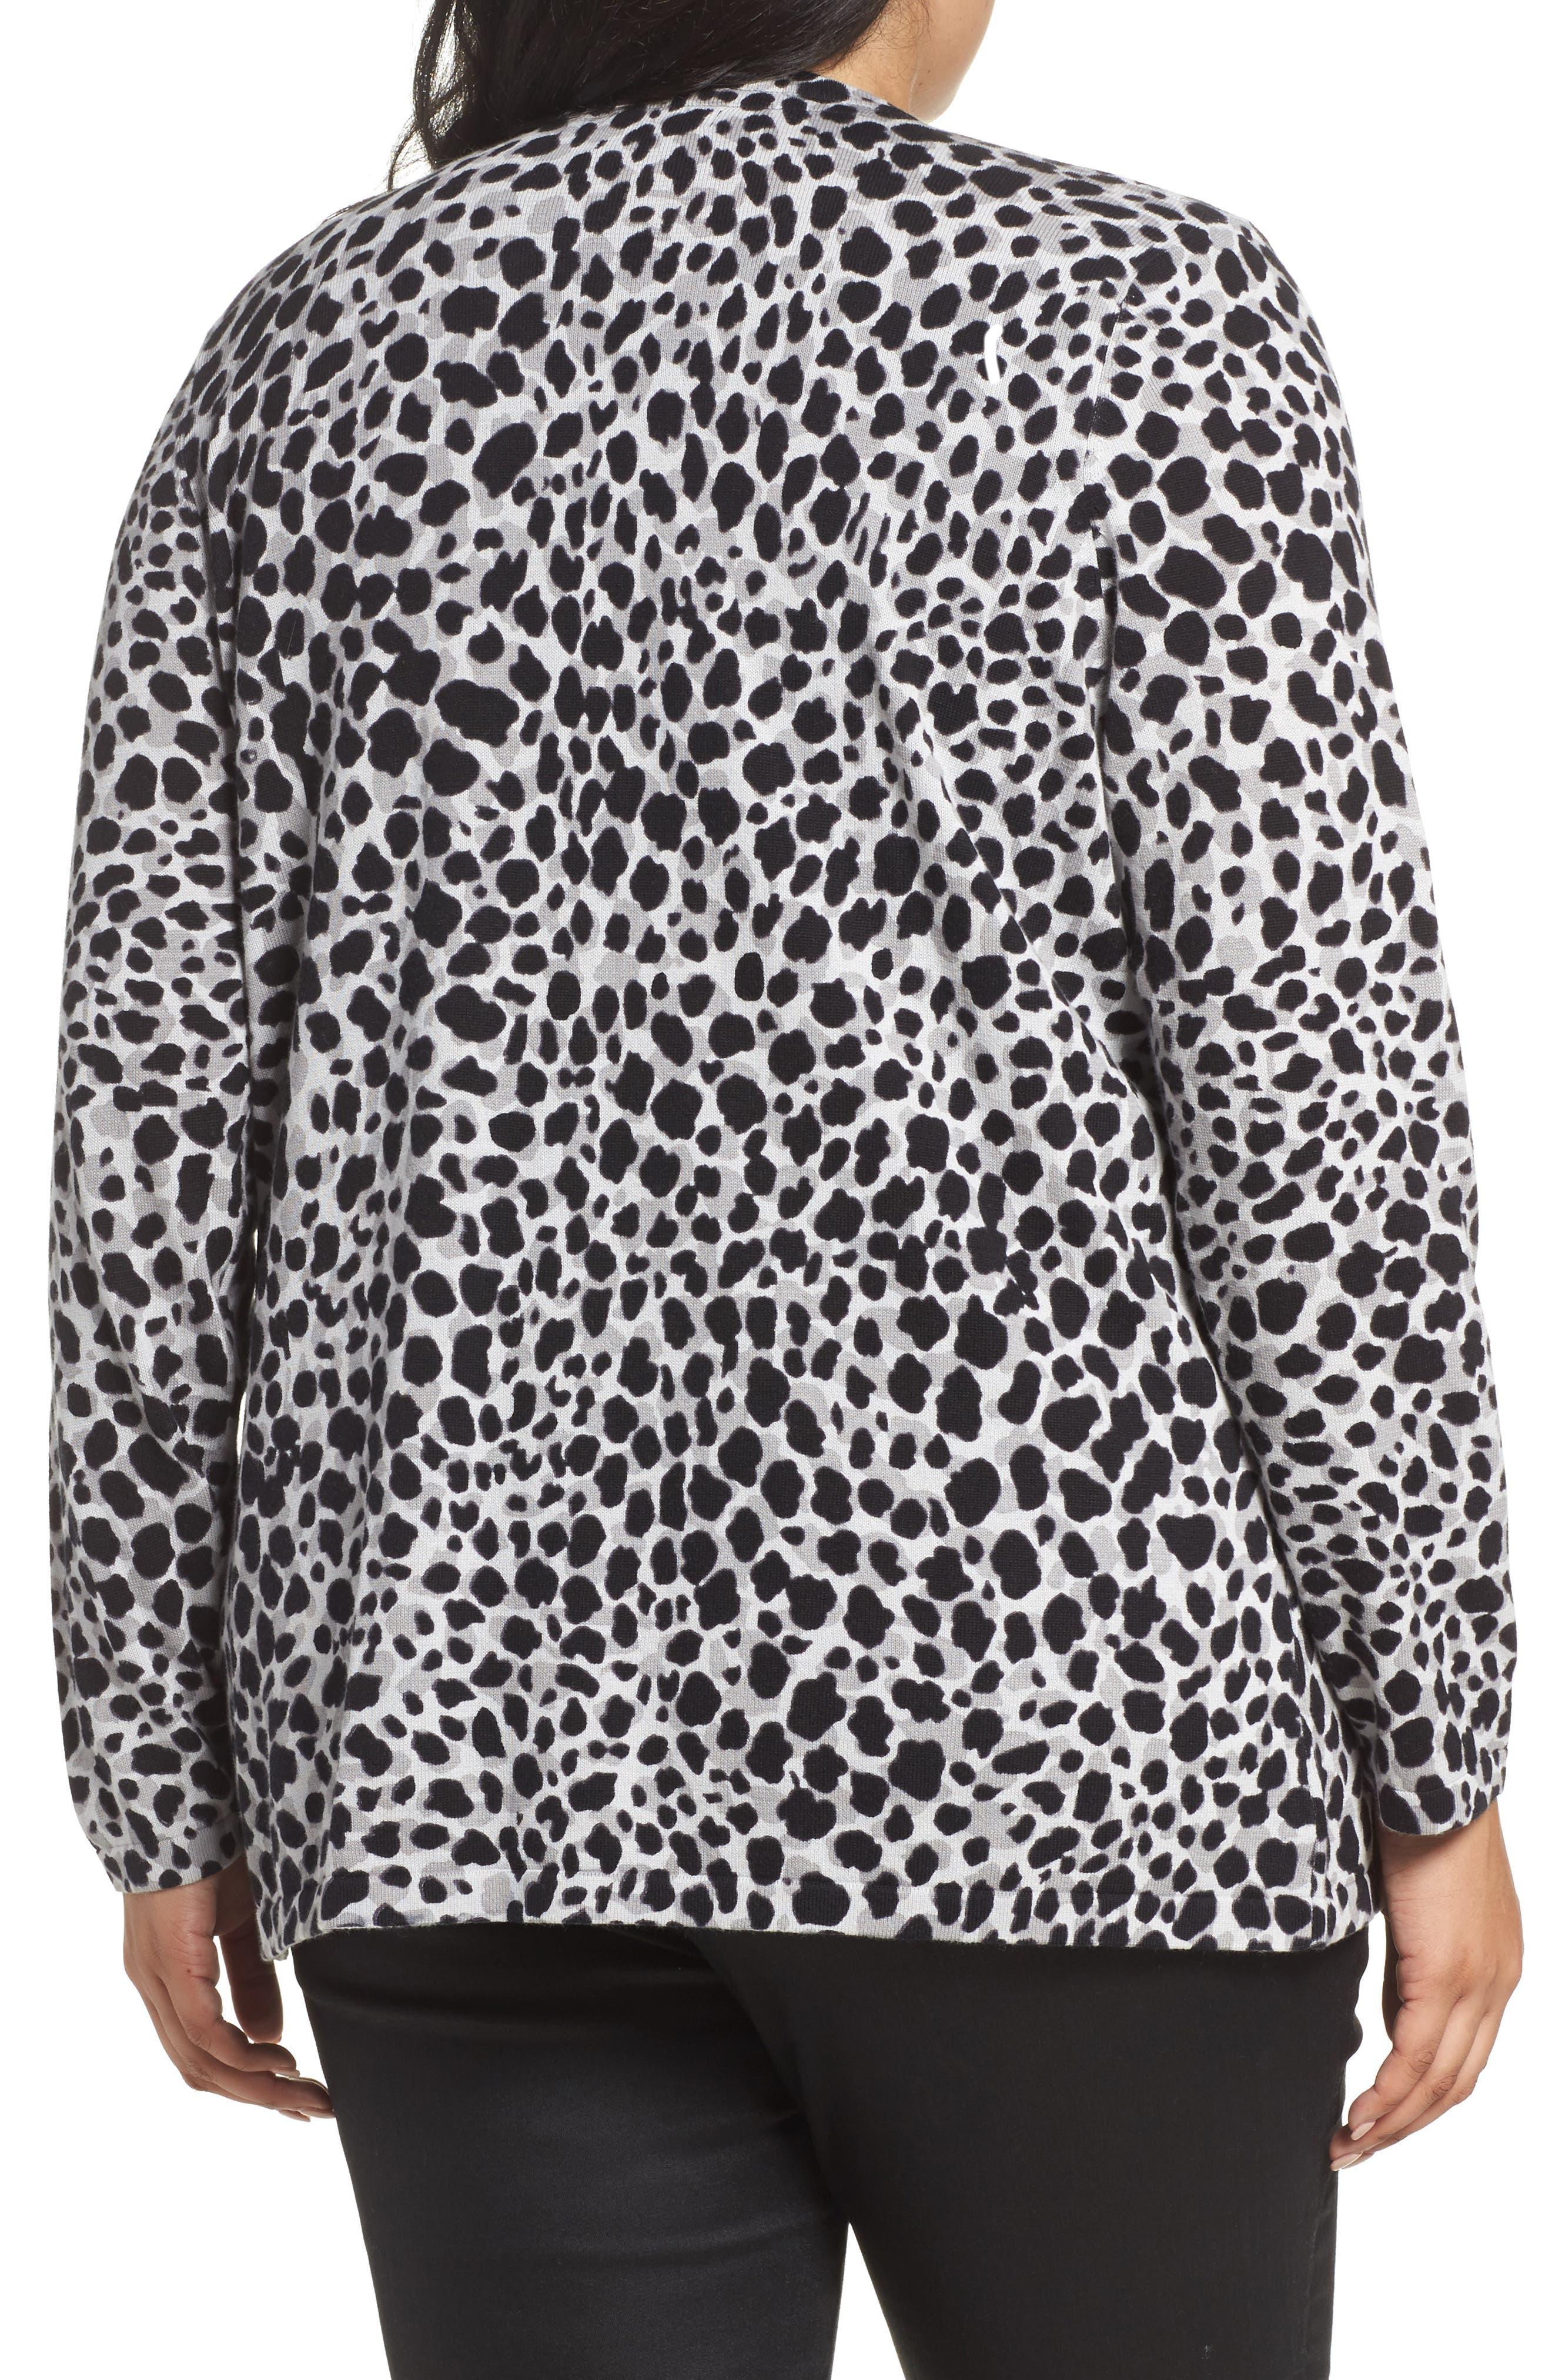 Alternate Image 2  - Foxcroft Maya Leopard Print Cotton Cardigan (Plus Size)